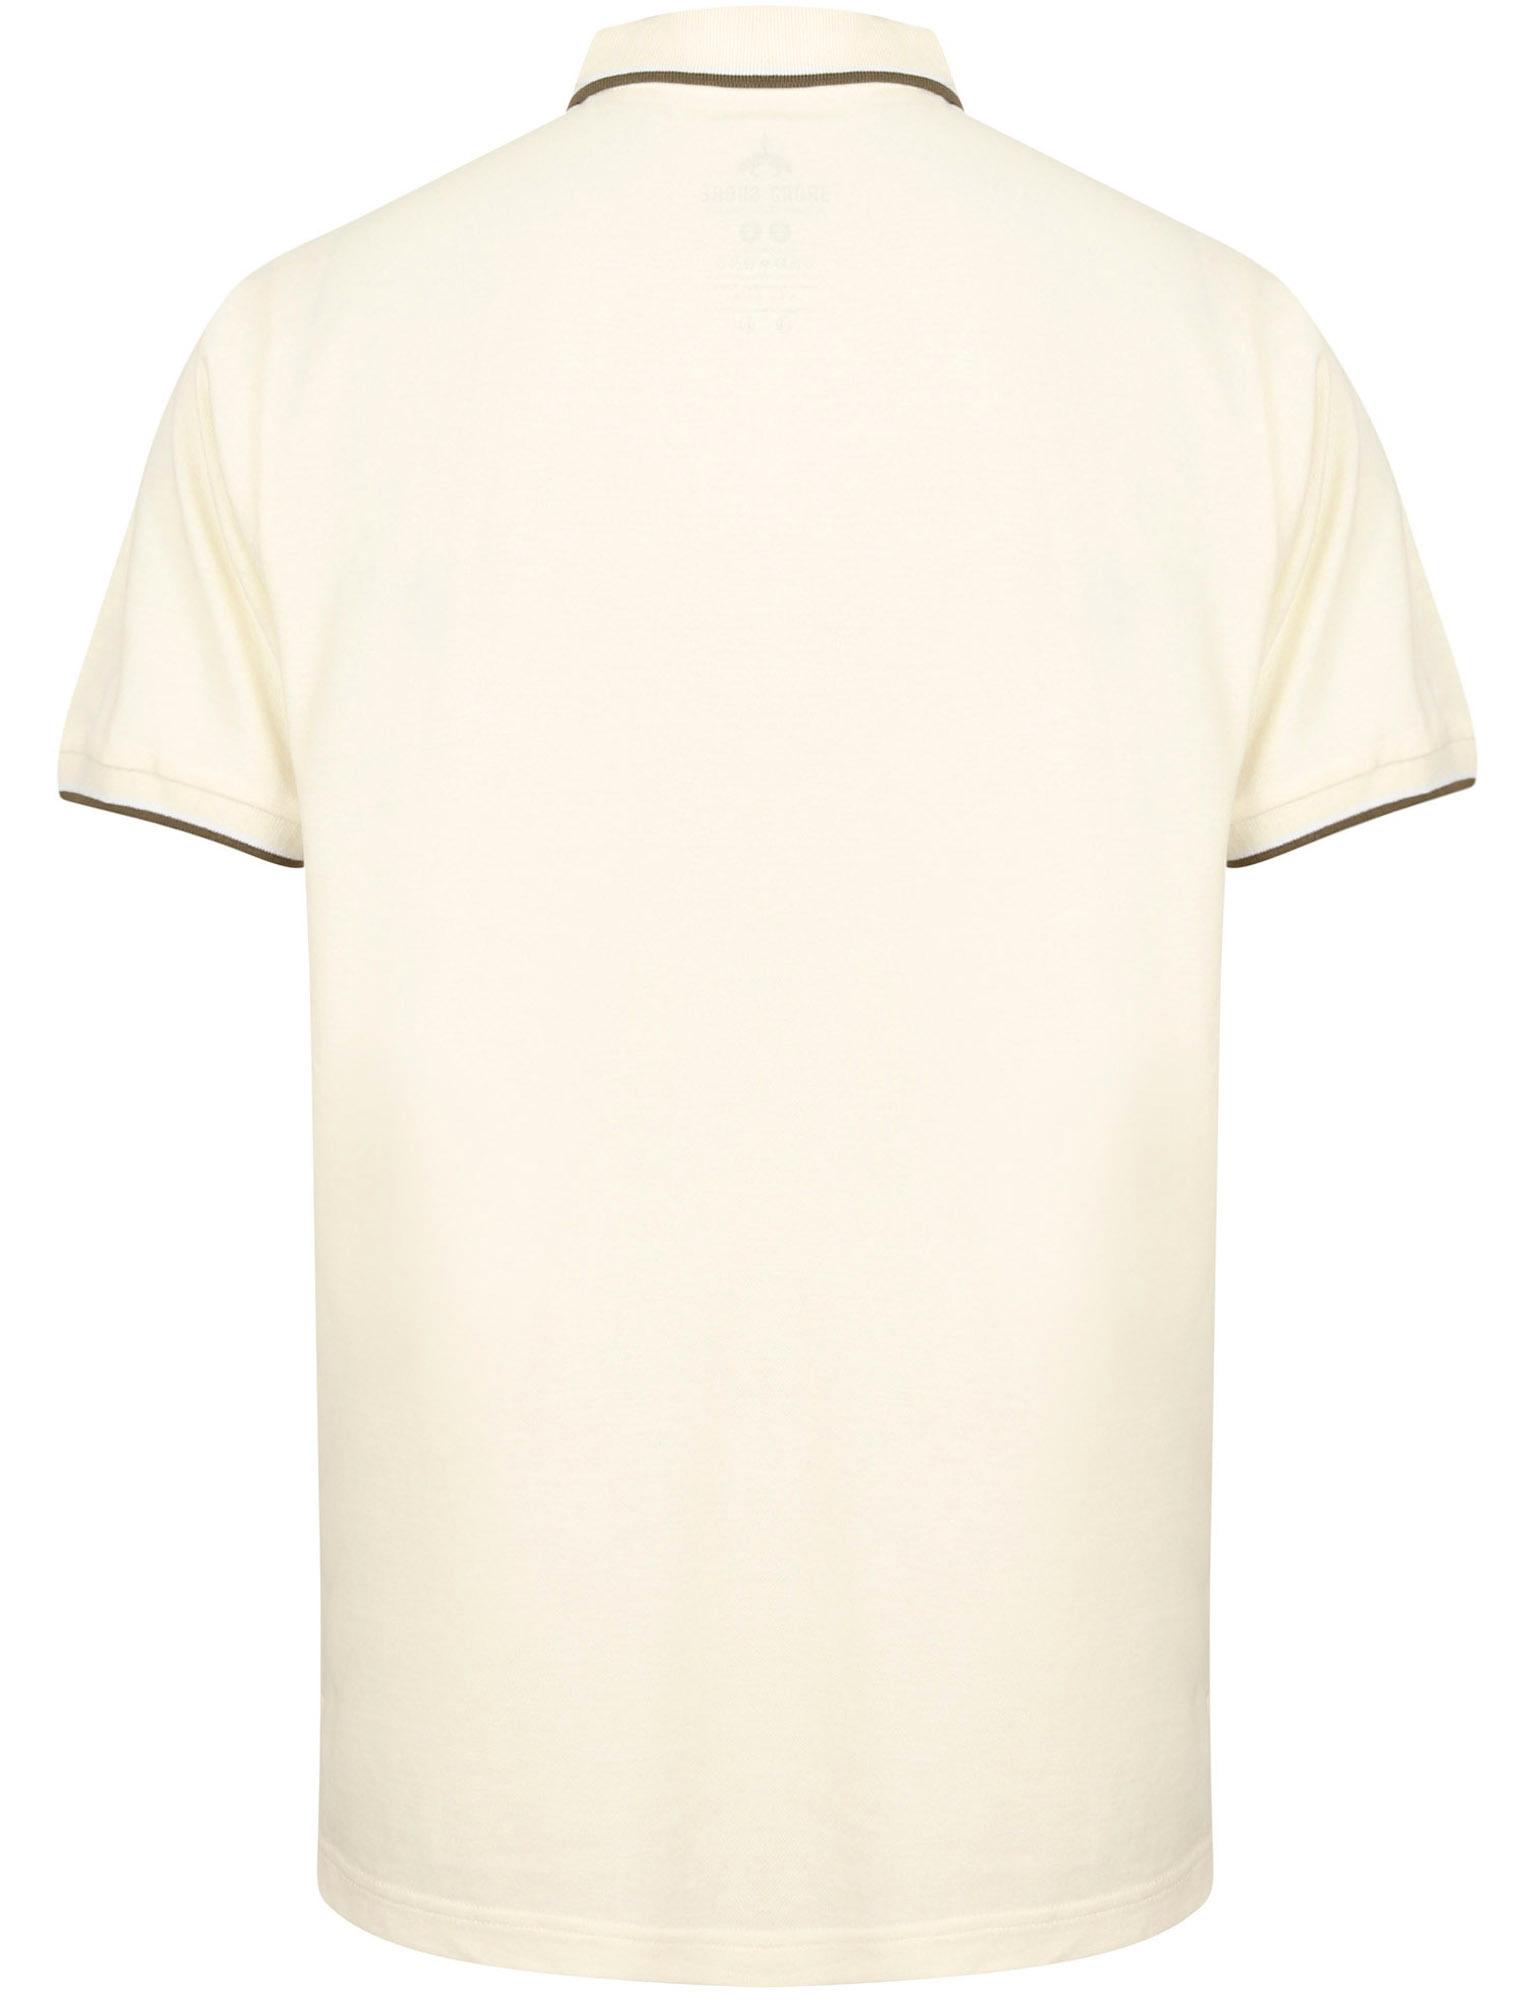 Sth-Shore-Mens-Plain-Polo-Shirt-100-Pique-Cotton-T-Shirt-Top-Collar-Size-M-XXL thumbnail 31